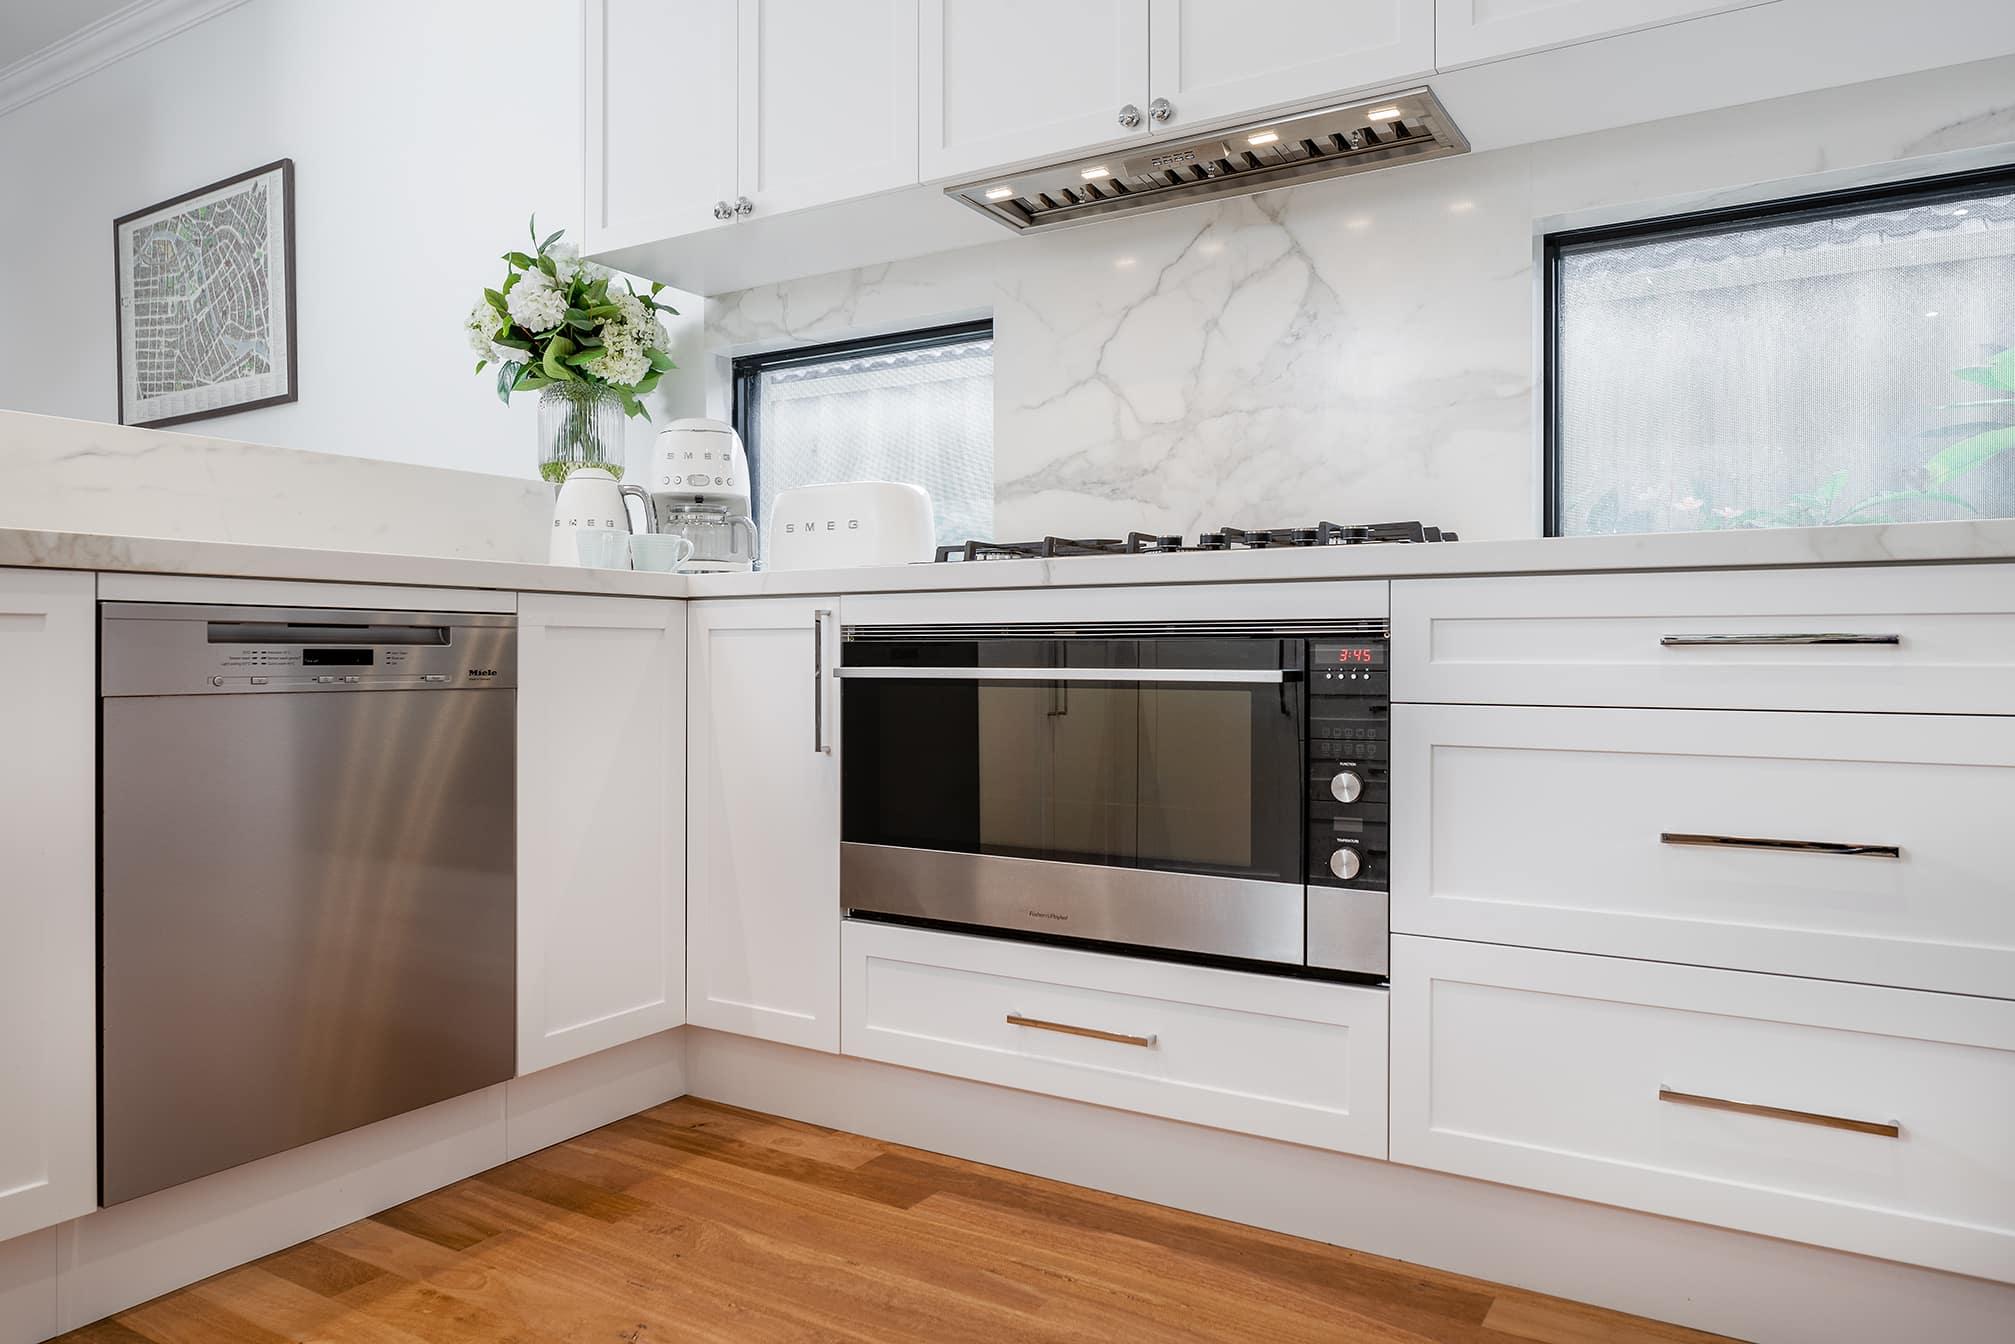 Joondanna Hamptons Kitchen oven and stove